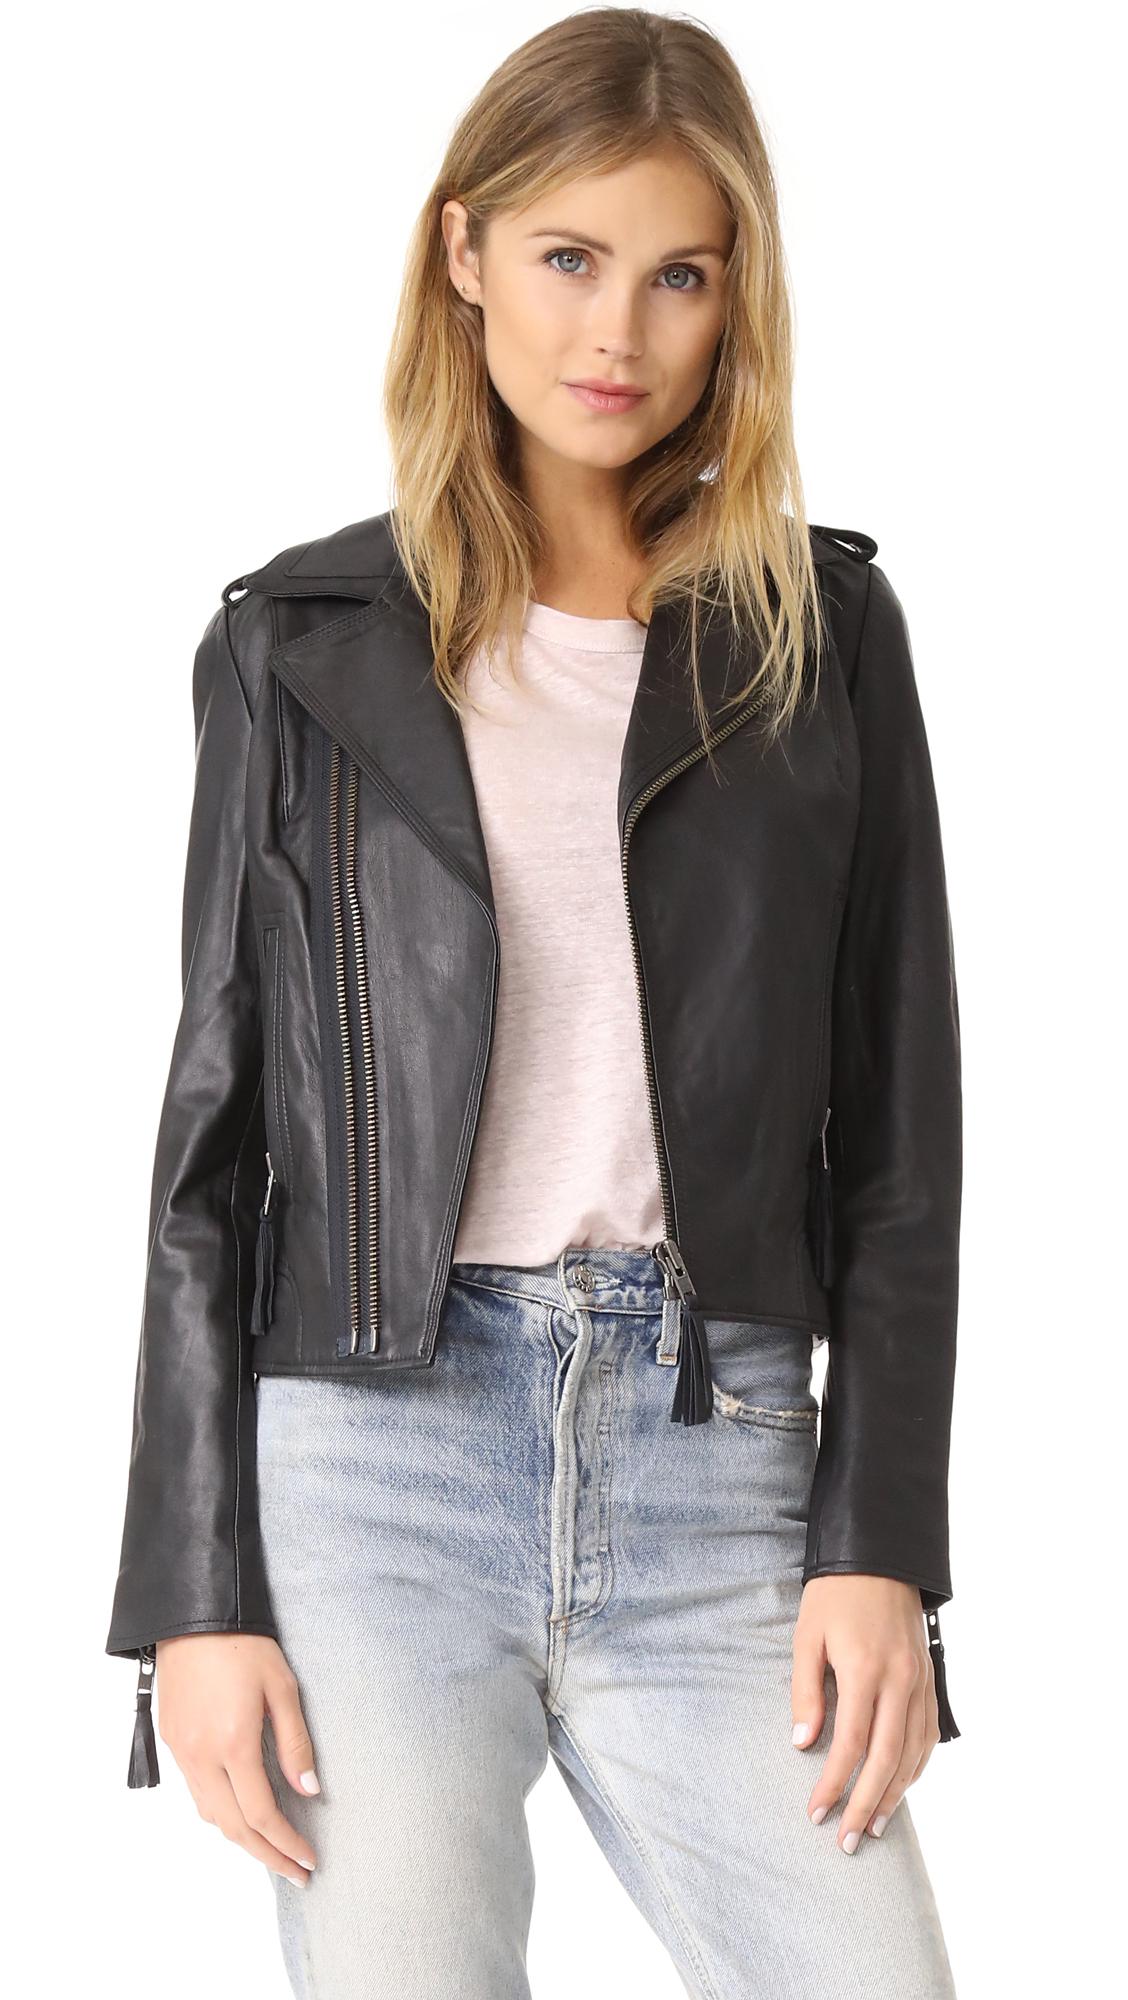 Joie Ailey Leather Jacket - Caviar